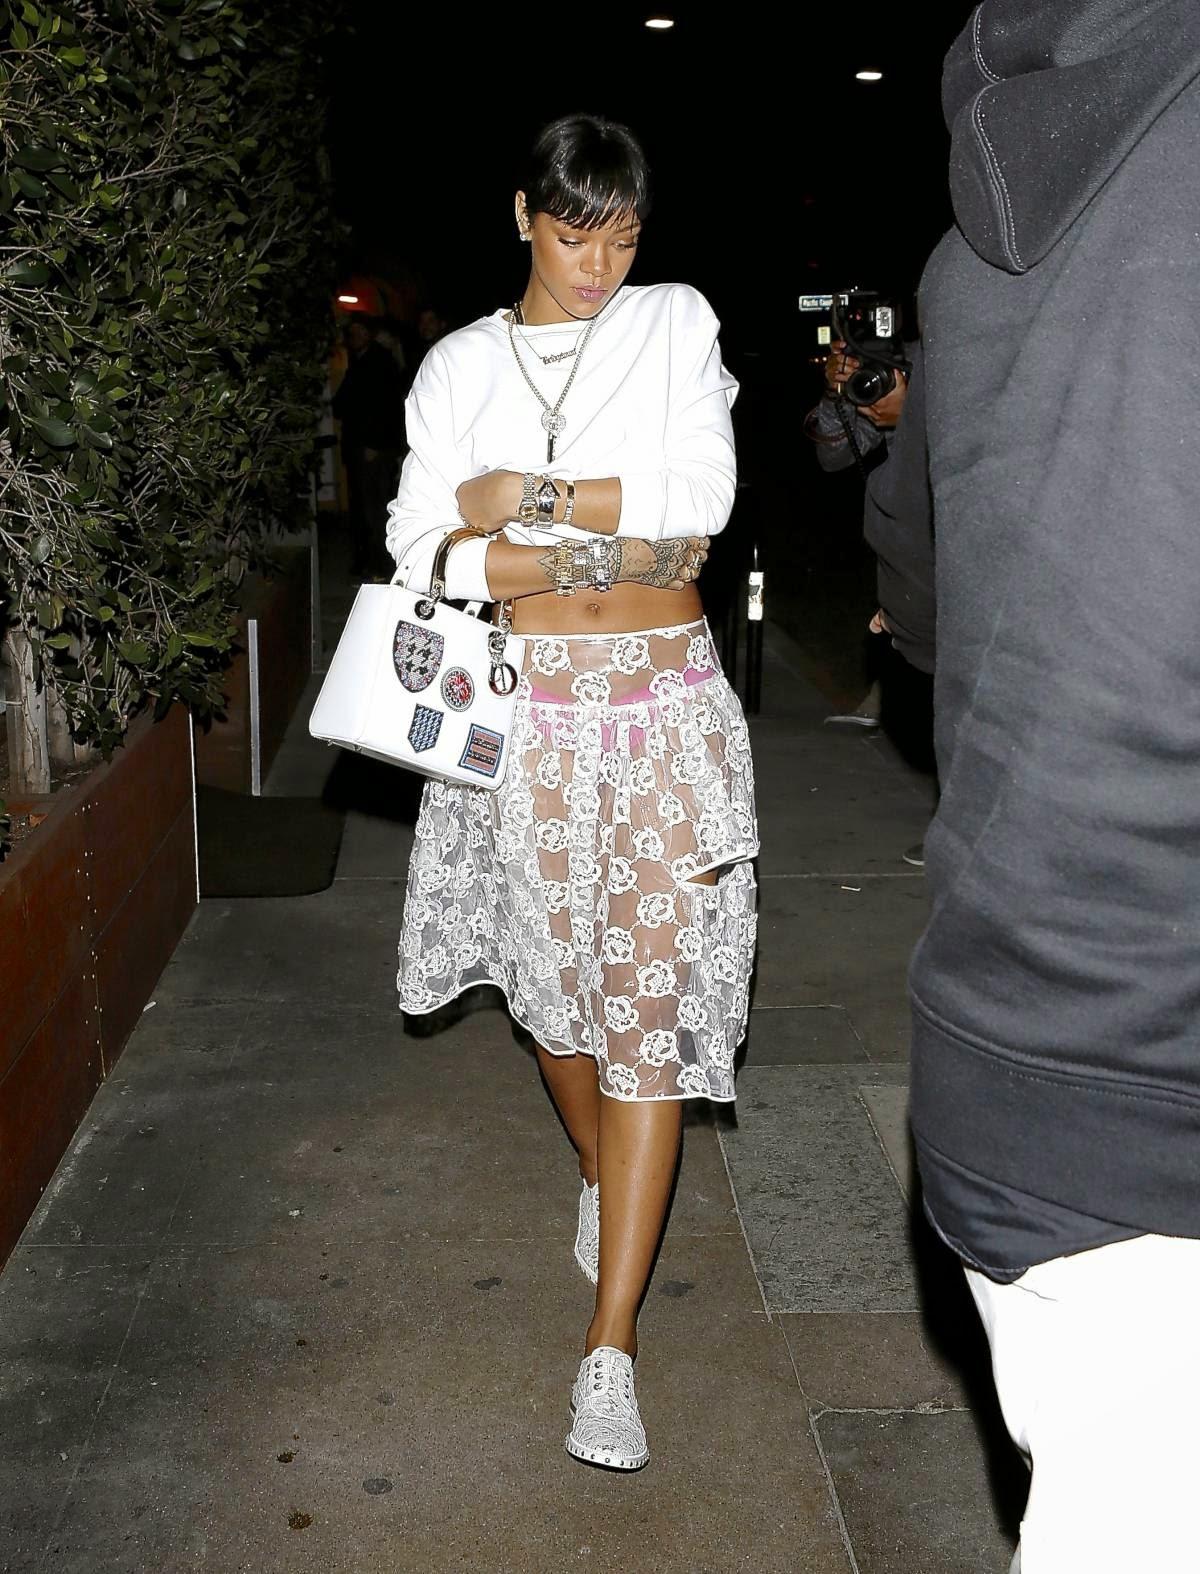 Rihanna See Through White Skirt Candids In L.A.